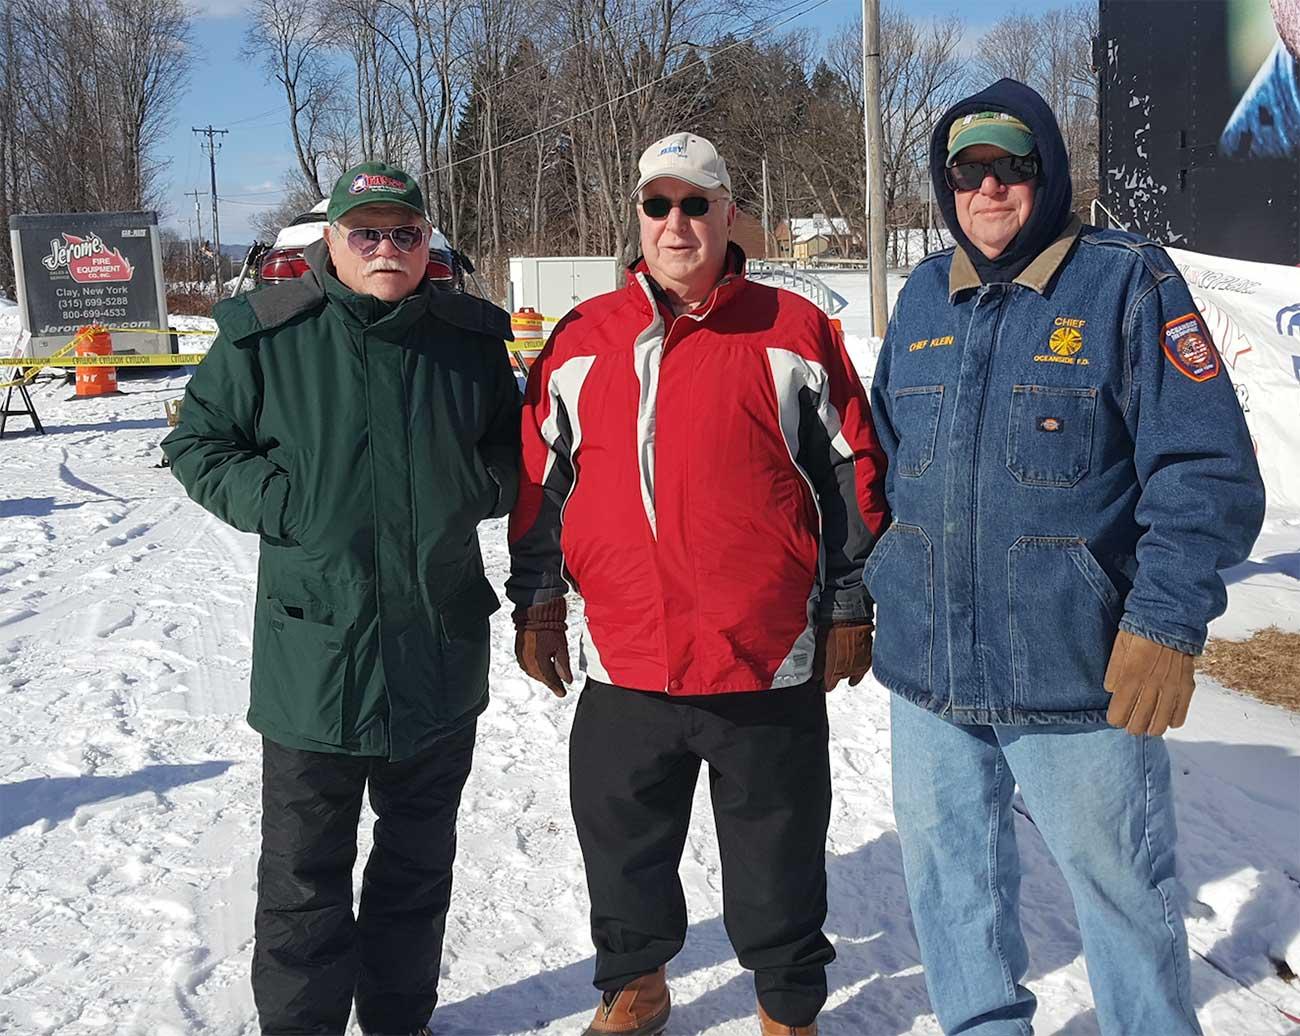 winter-games-2017